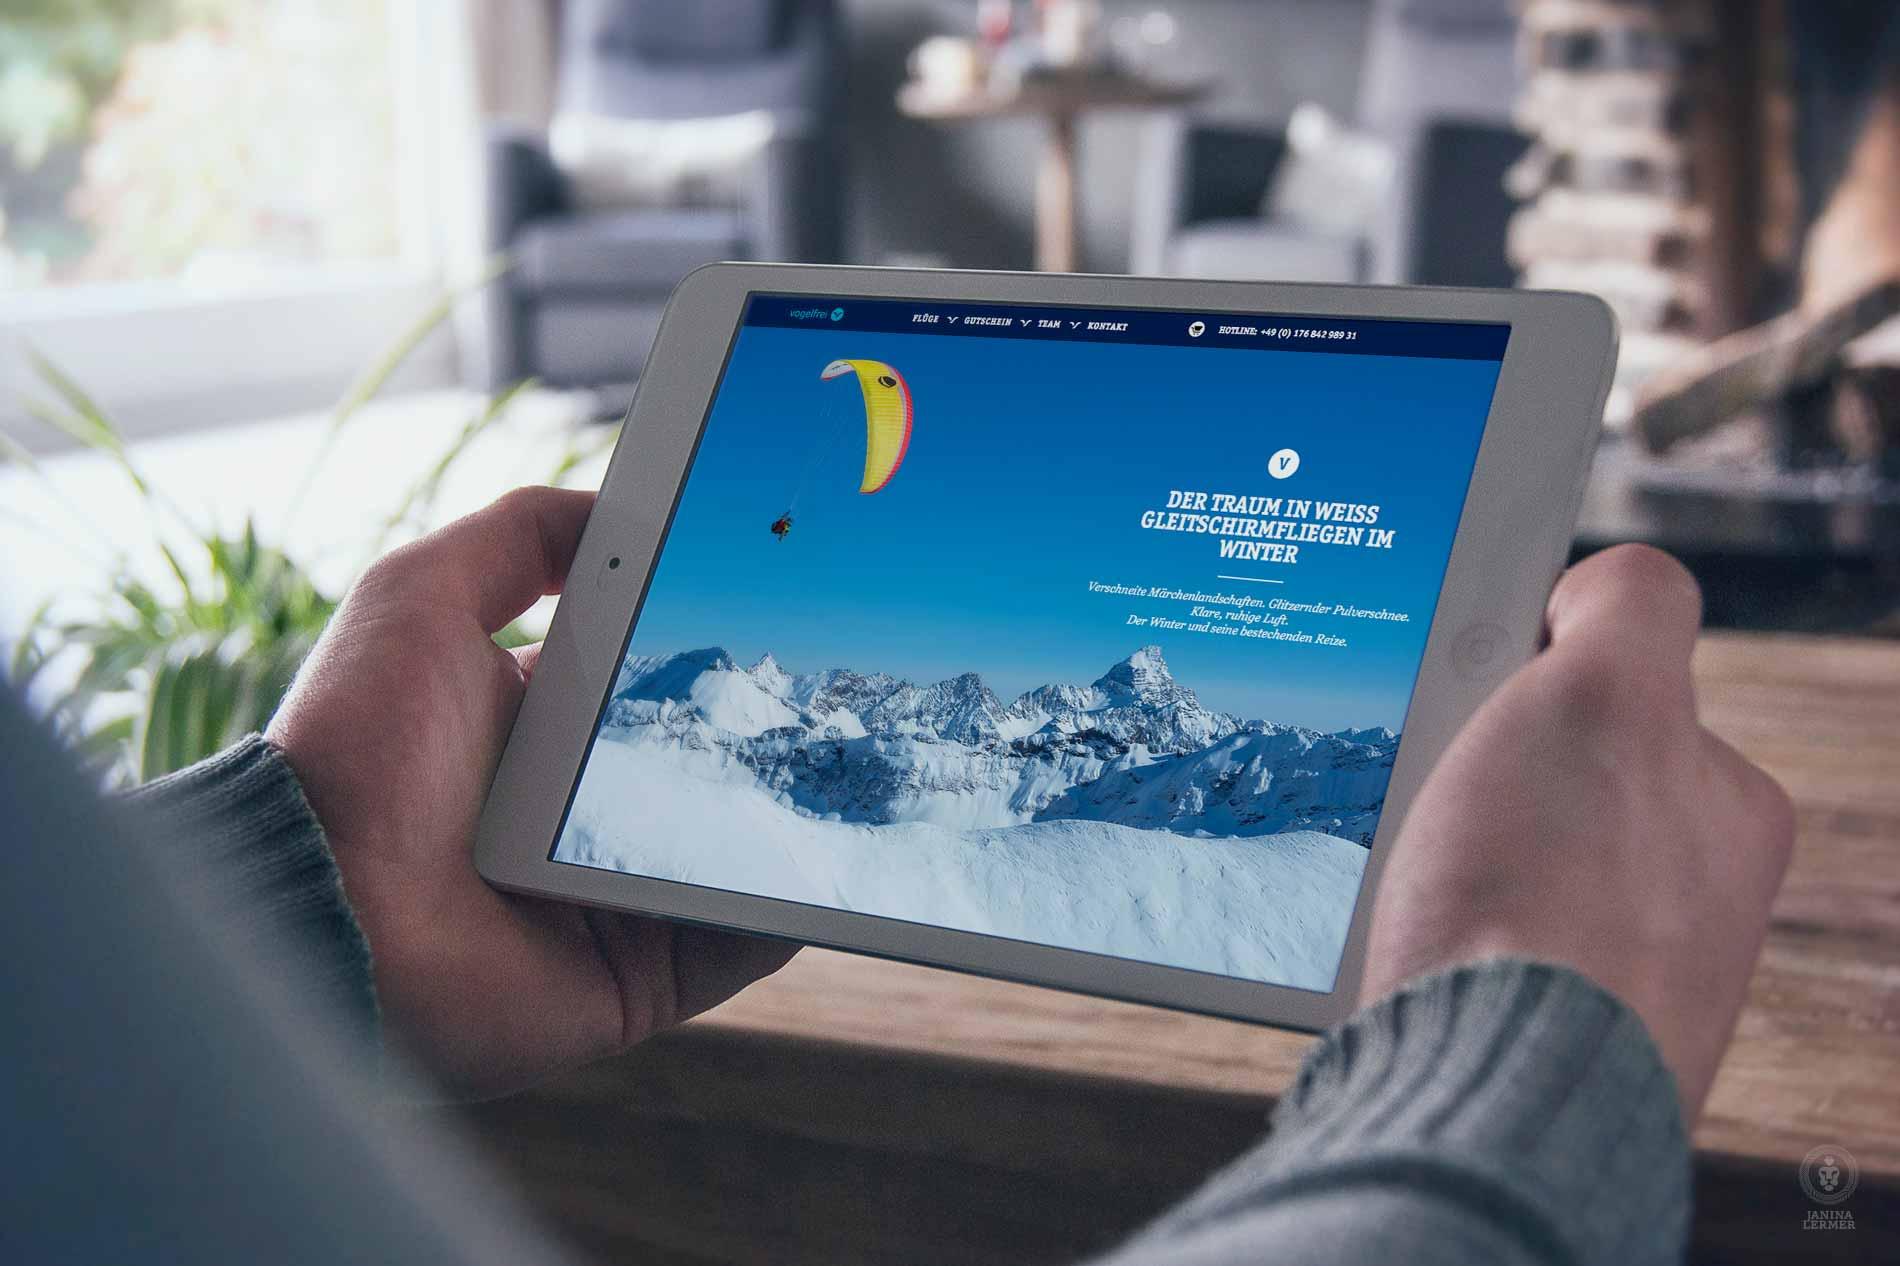 Janina-Lermer-Webseitenkonzept-Webseitengestaltung-Webdesign-Vogelfrei-Tablet_Winter